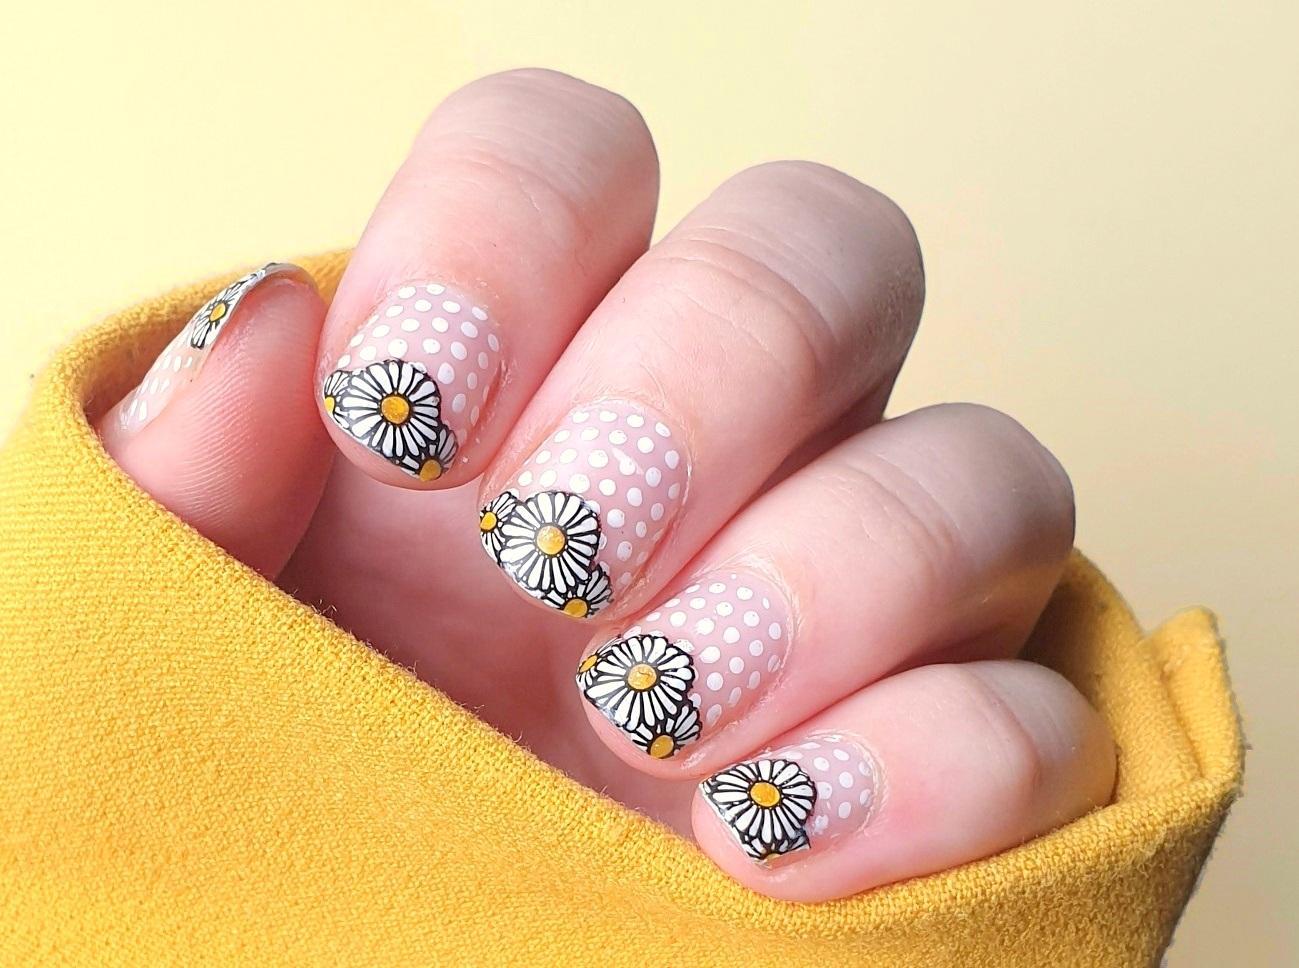 Montagspinselei Negative Space Ganseblümchen Nailart